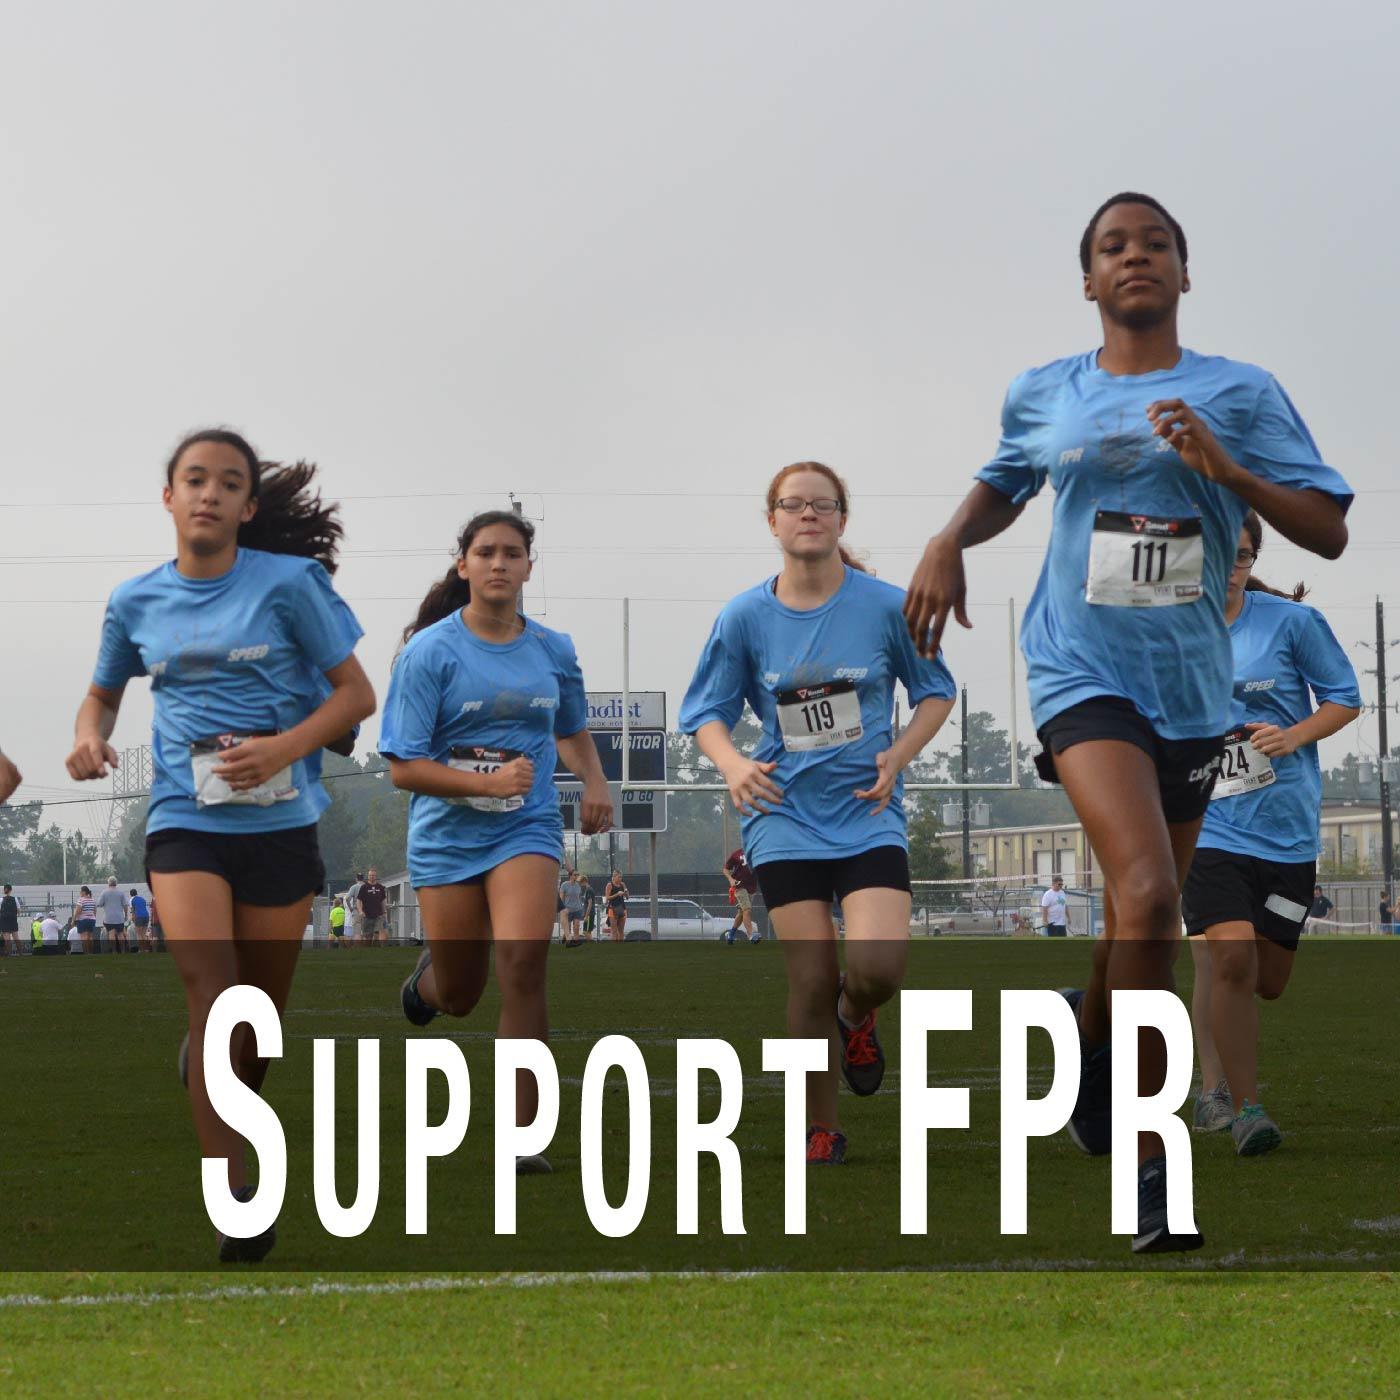 support fpr.jpg